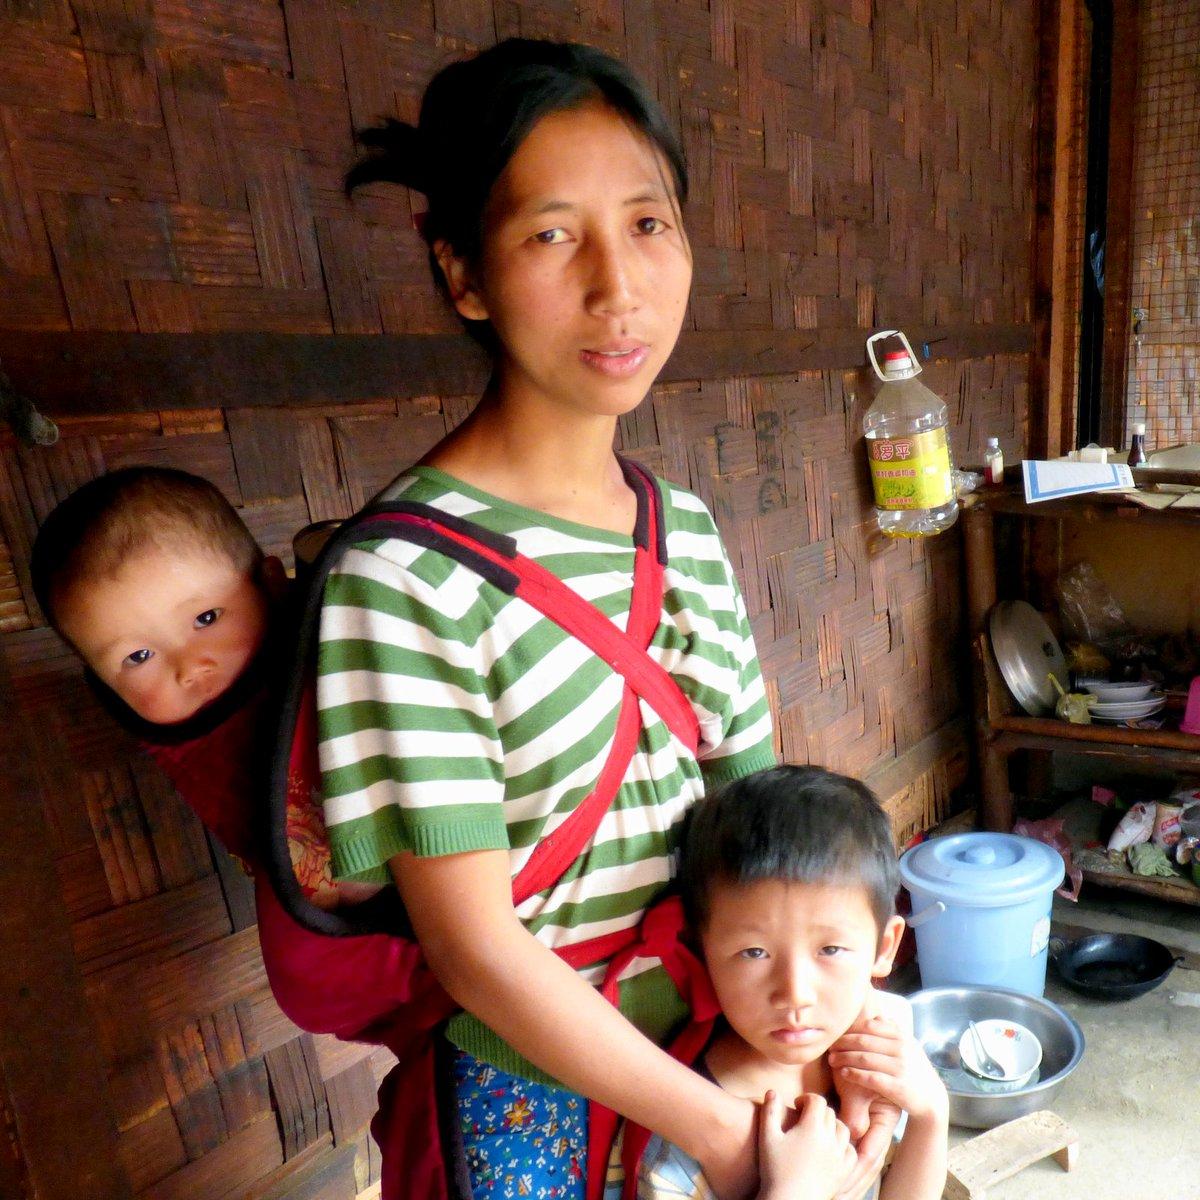 """Having no school in the camp, children need to walk almost 2 hours.&quot; -IDP in #Kachin #Myanmar  https://www. facebook.com/OCHAMyanmar/ph otos/a.794527937253768.1073741831.650844591622104/1521691754537379/?type=3 &nbsp; …  #EducationCannotWait<br>http://pic.twitter.com/JMY78d2AP1"